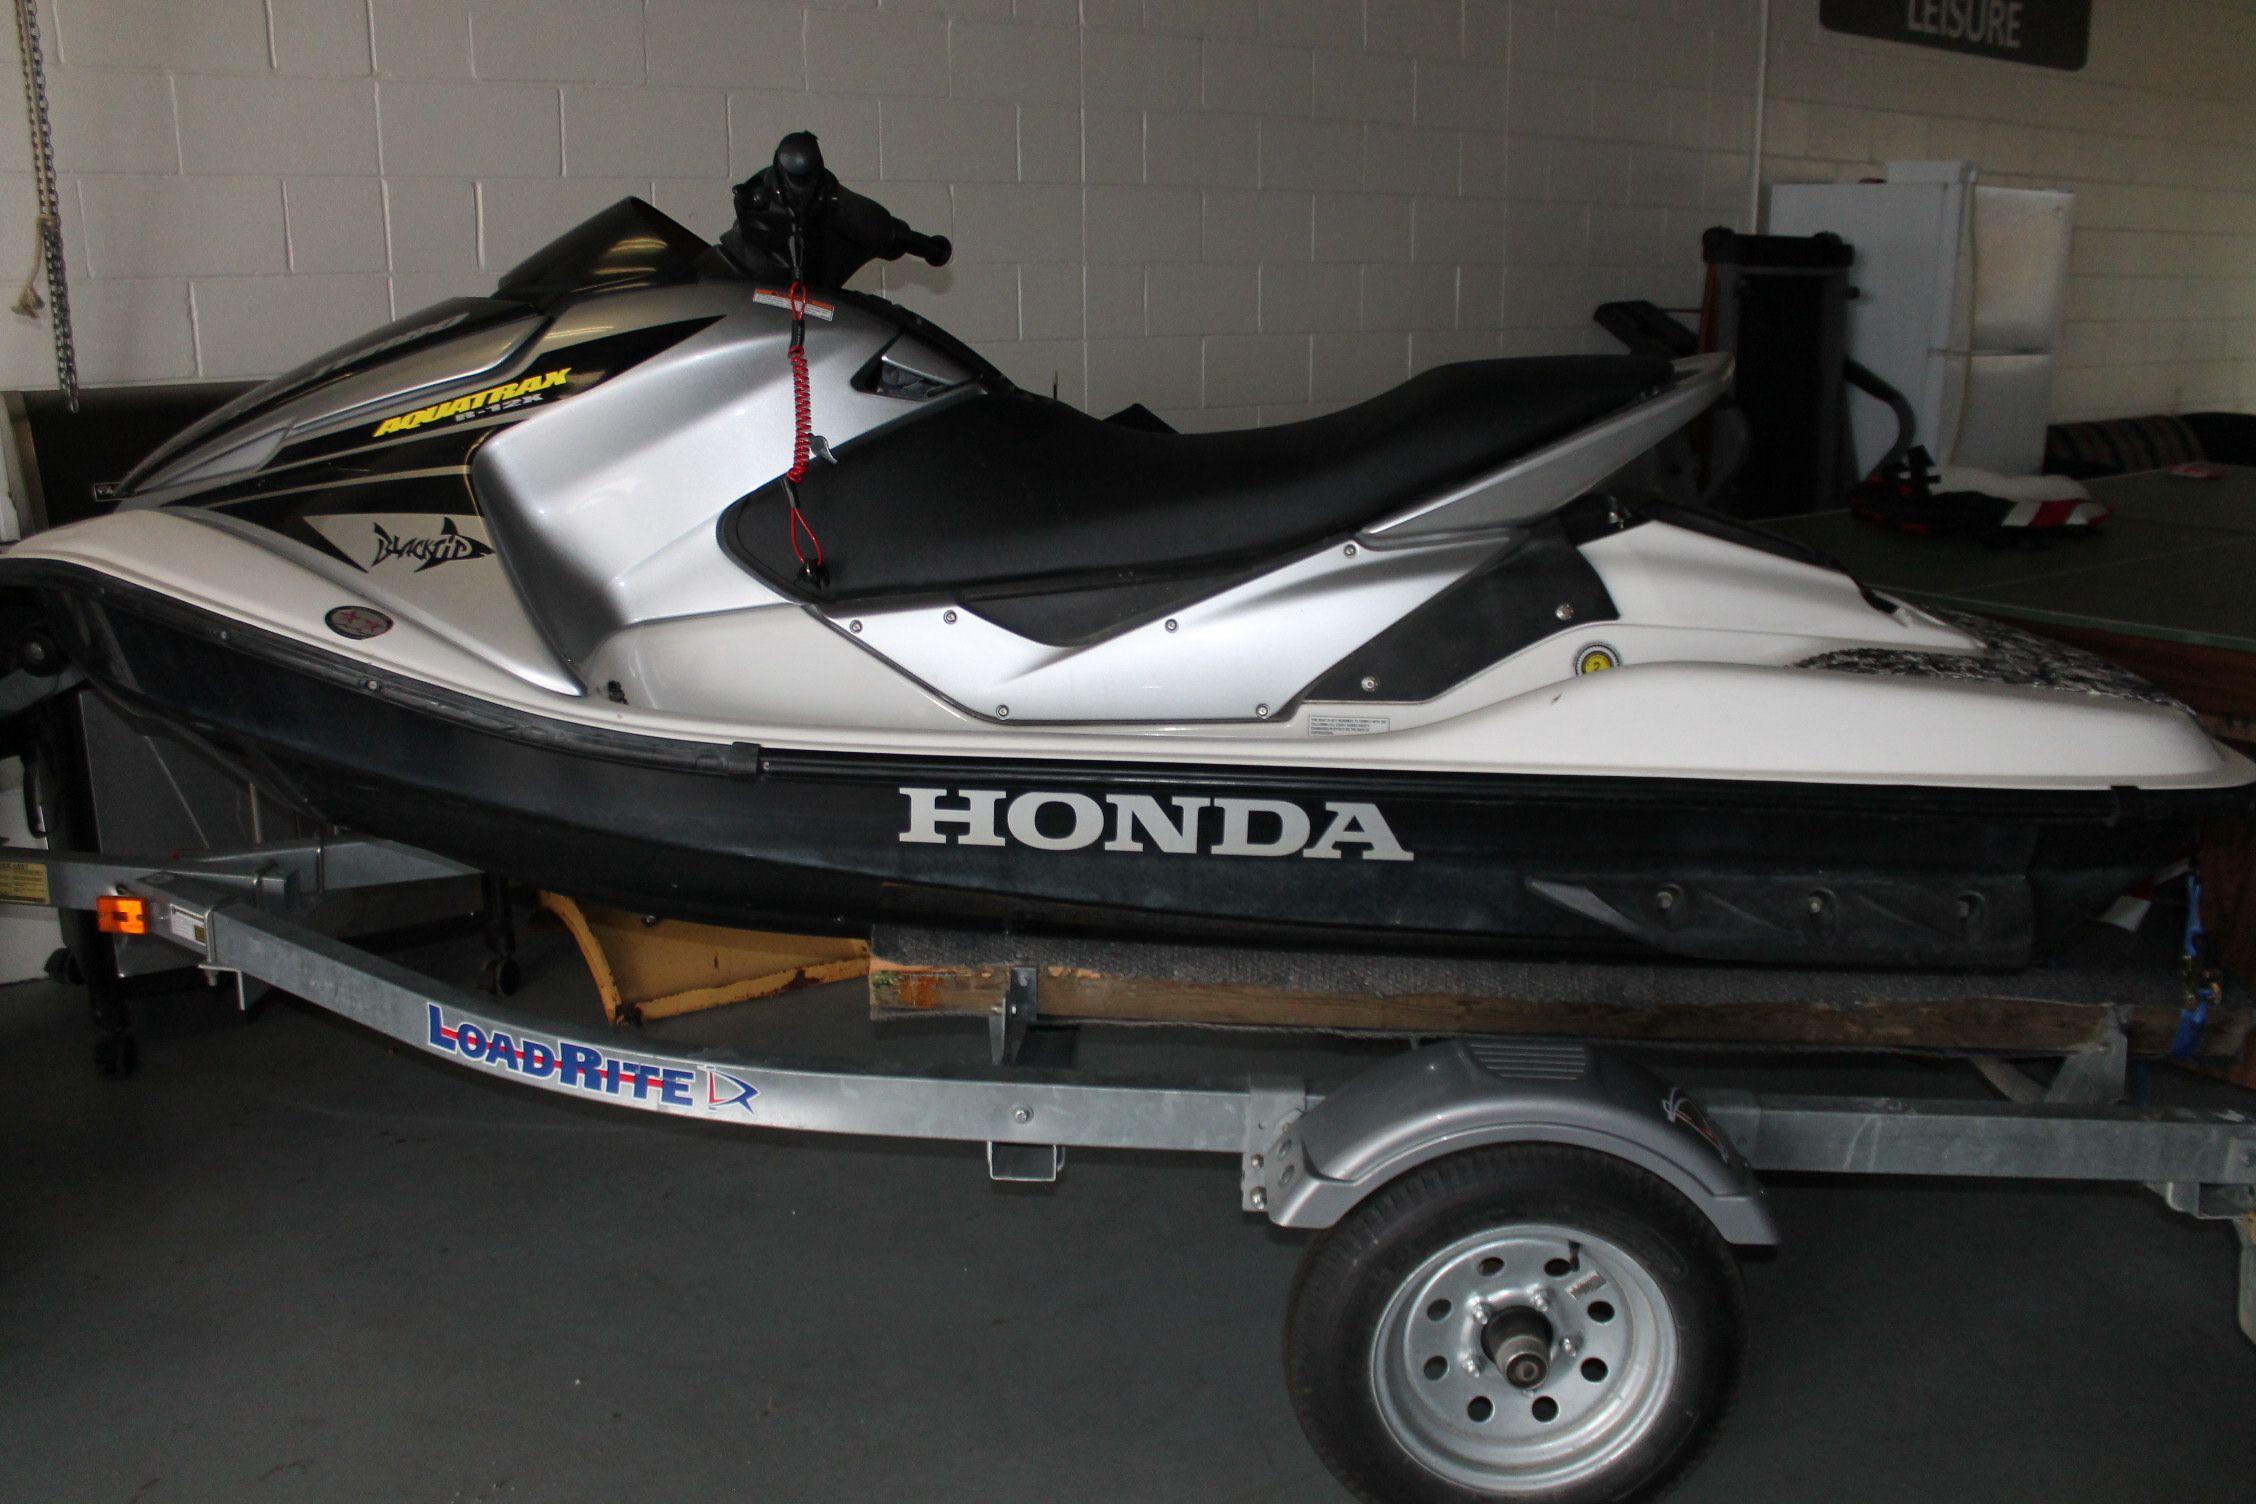 honda waverunner | Honda Watercraft Aquatrax R-12X Turbo 4-Stroke | New &  Used Cars .